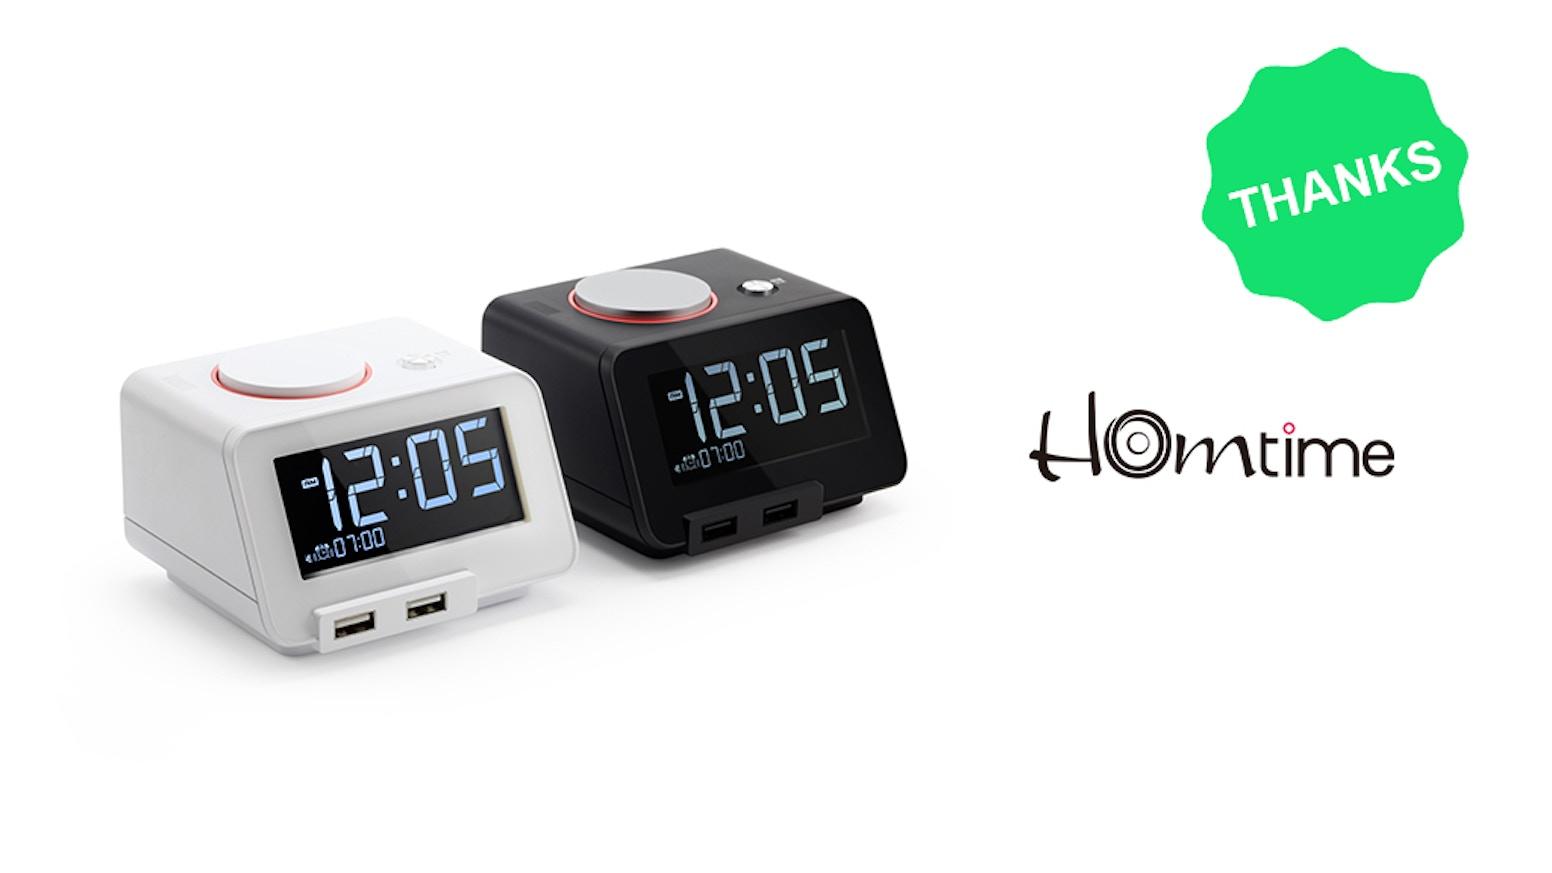 Gesture-controlled nightlight, jumbo-display time, speaker, dual USB  charging ports